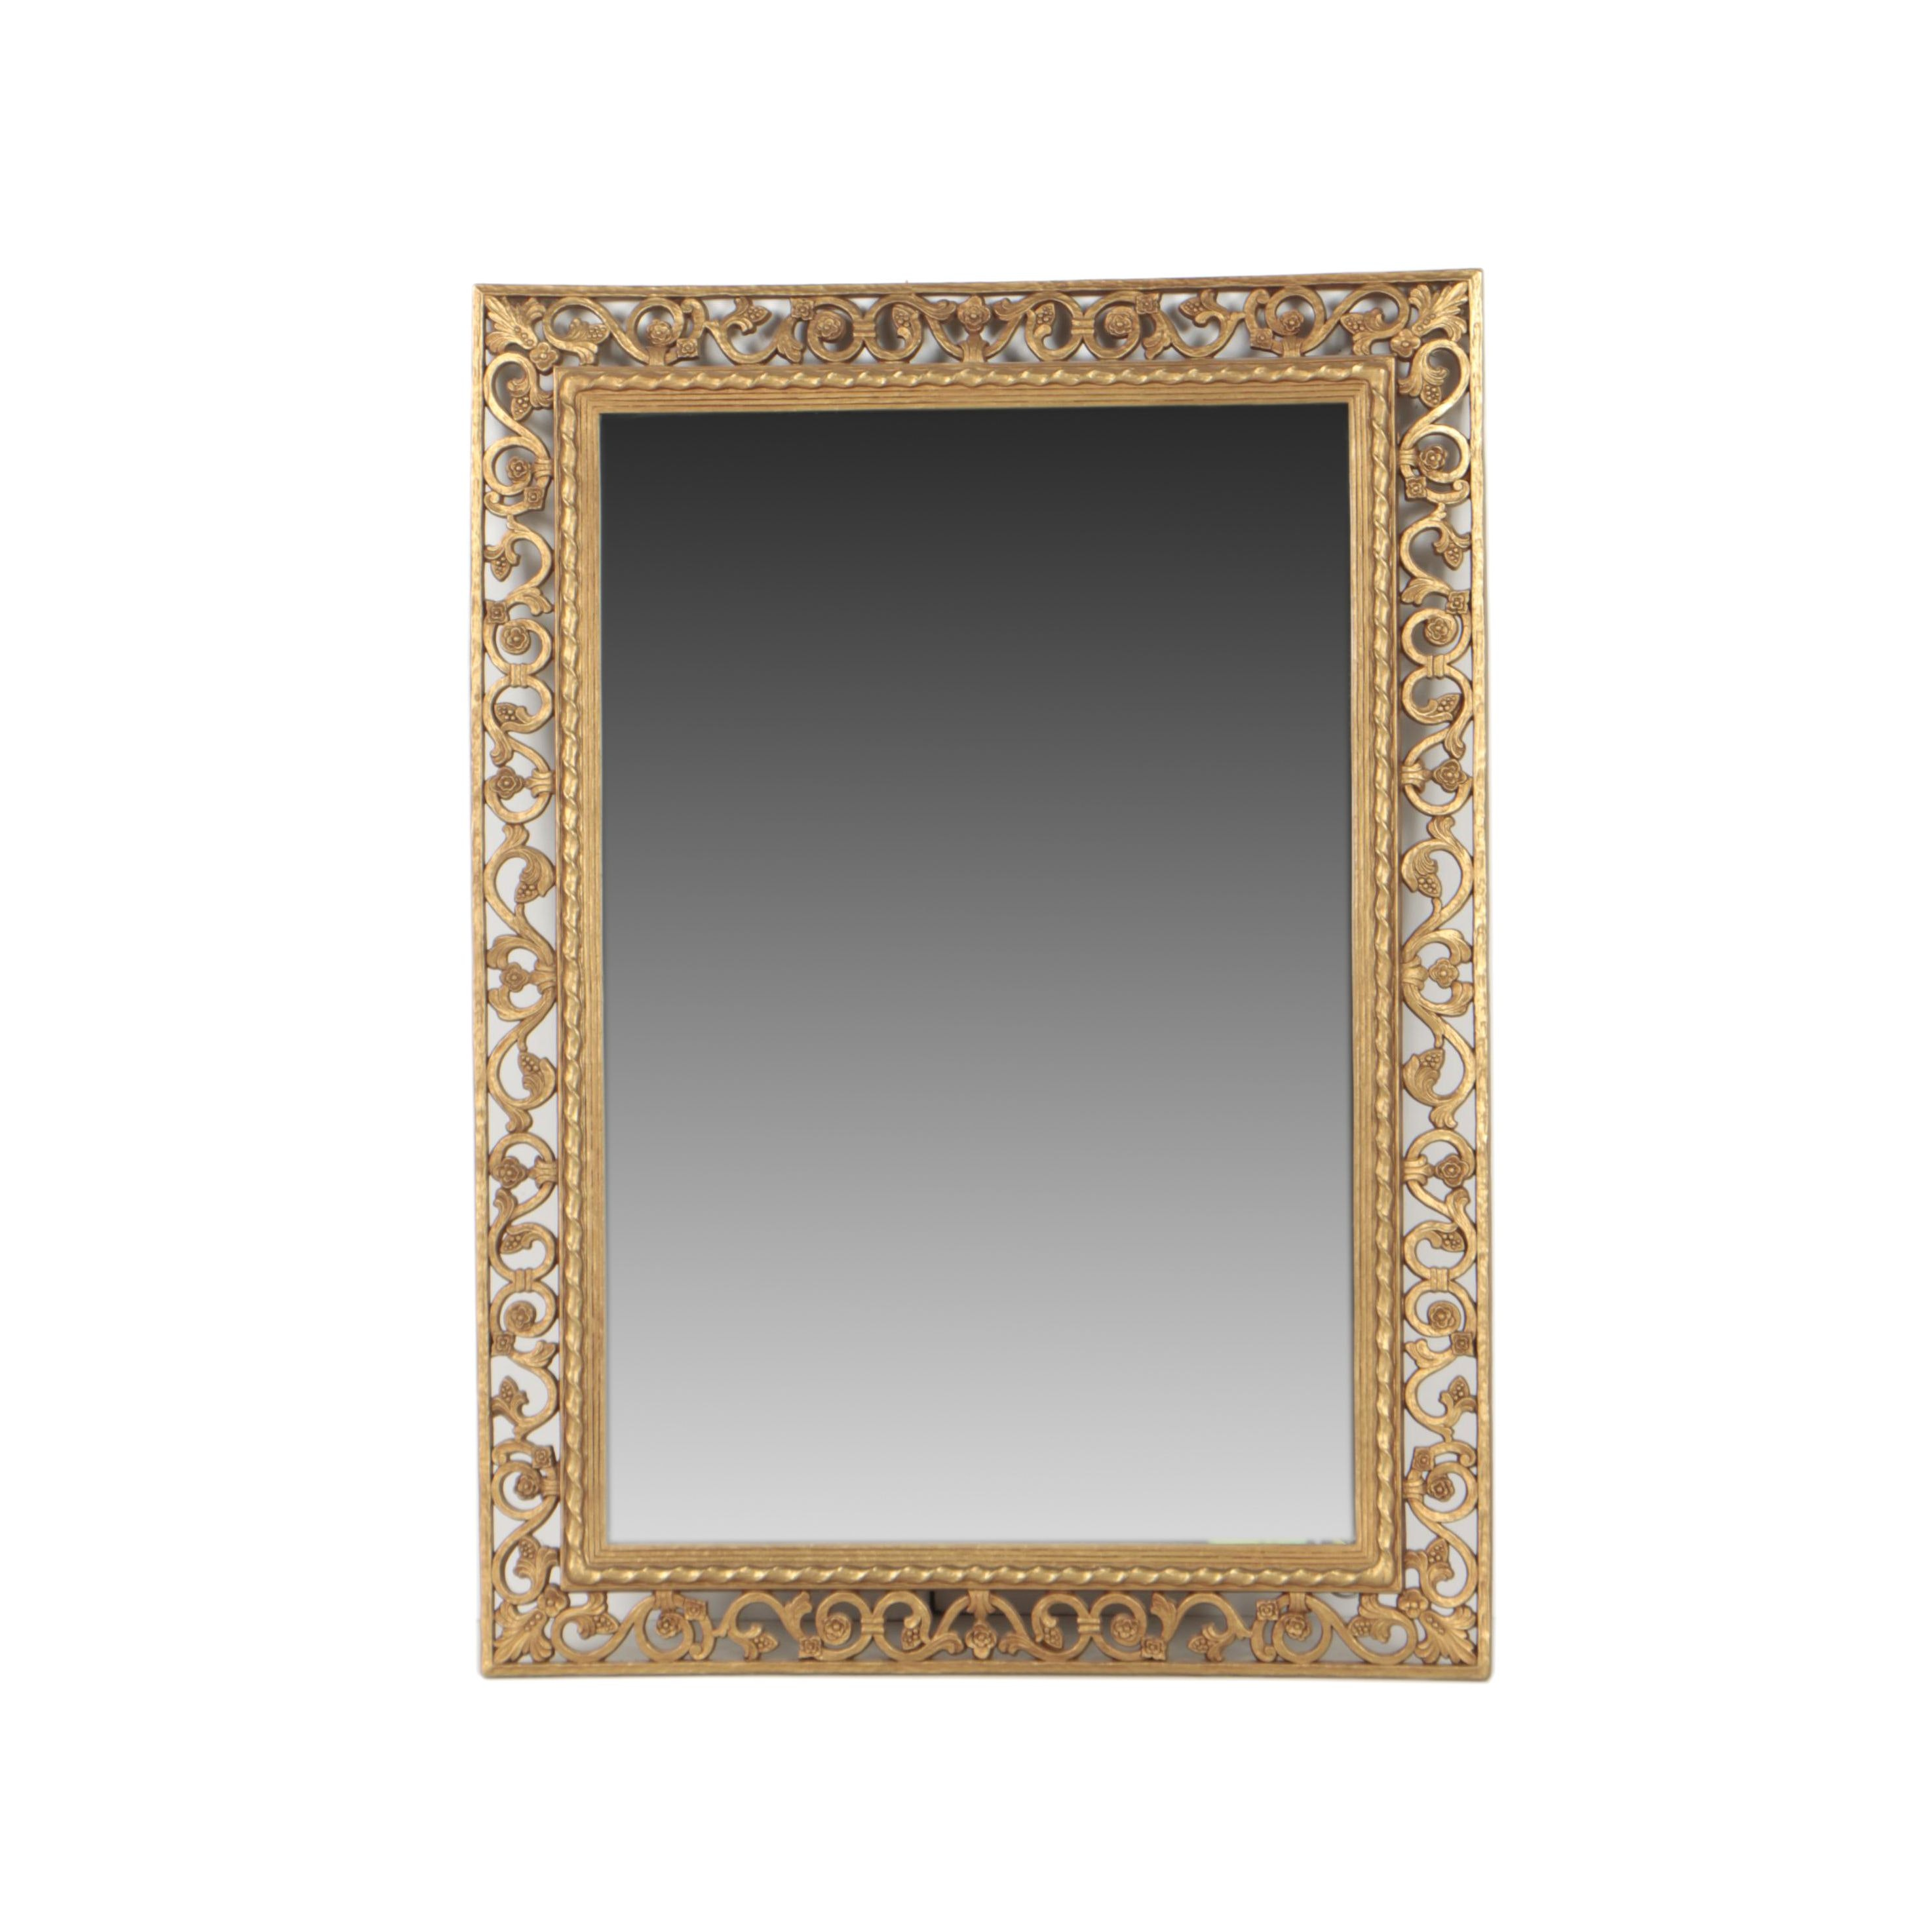 Decorative Gold Tone Filigree Wall Mirror